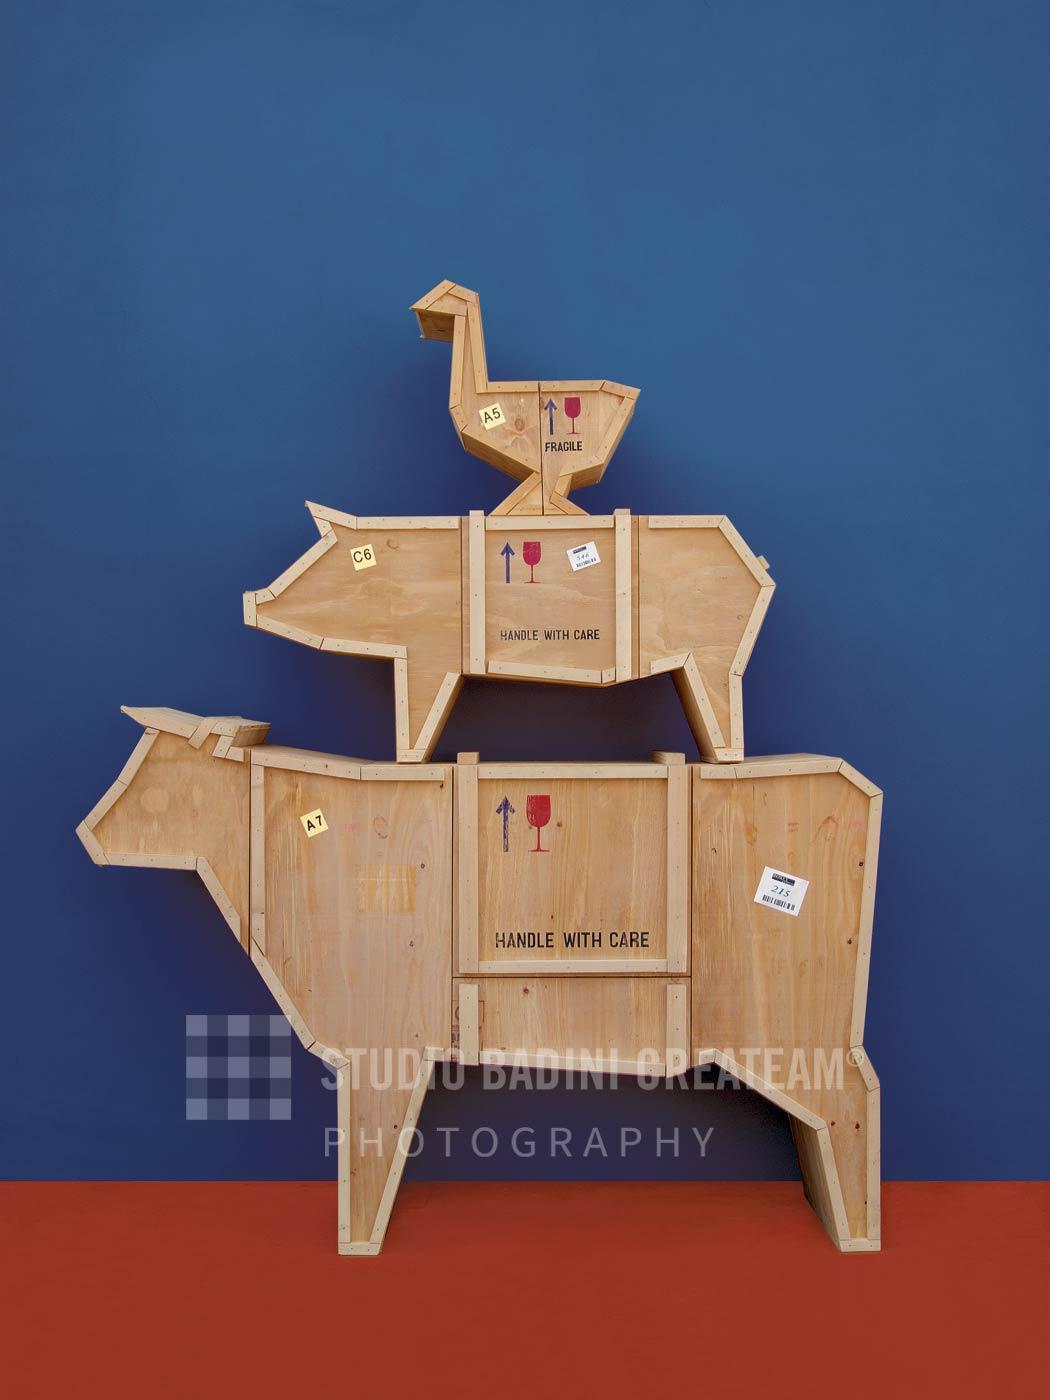 Badini Creative Studio - fotografia - seletti - sending animals